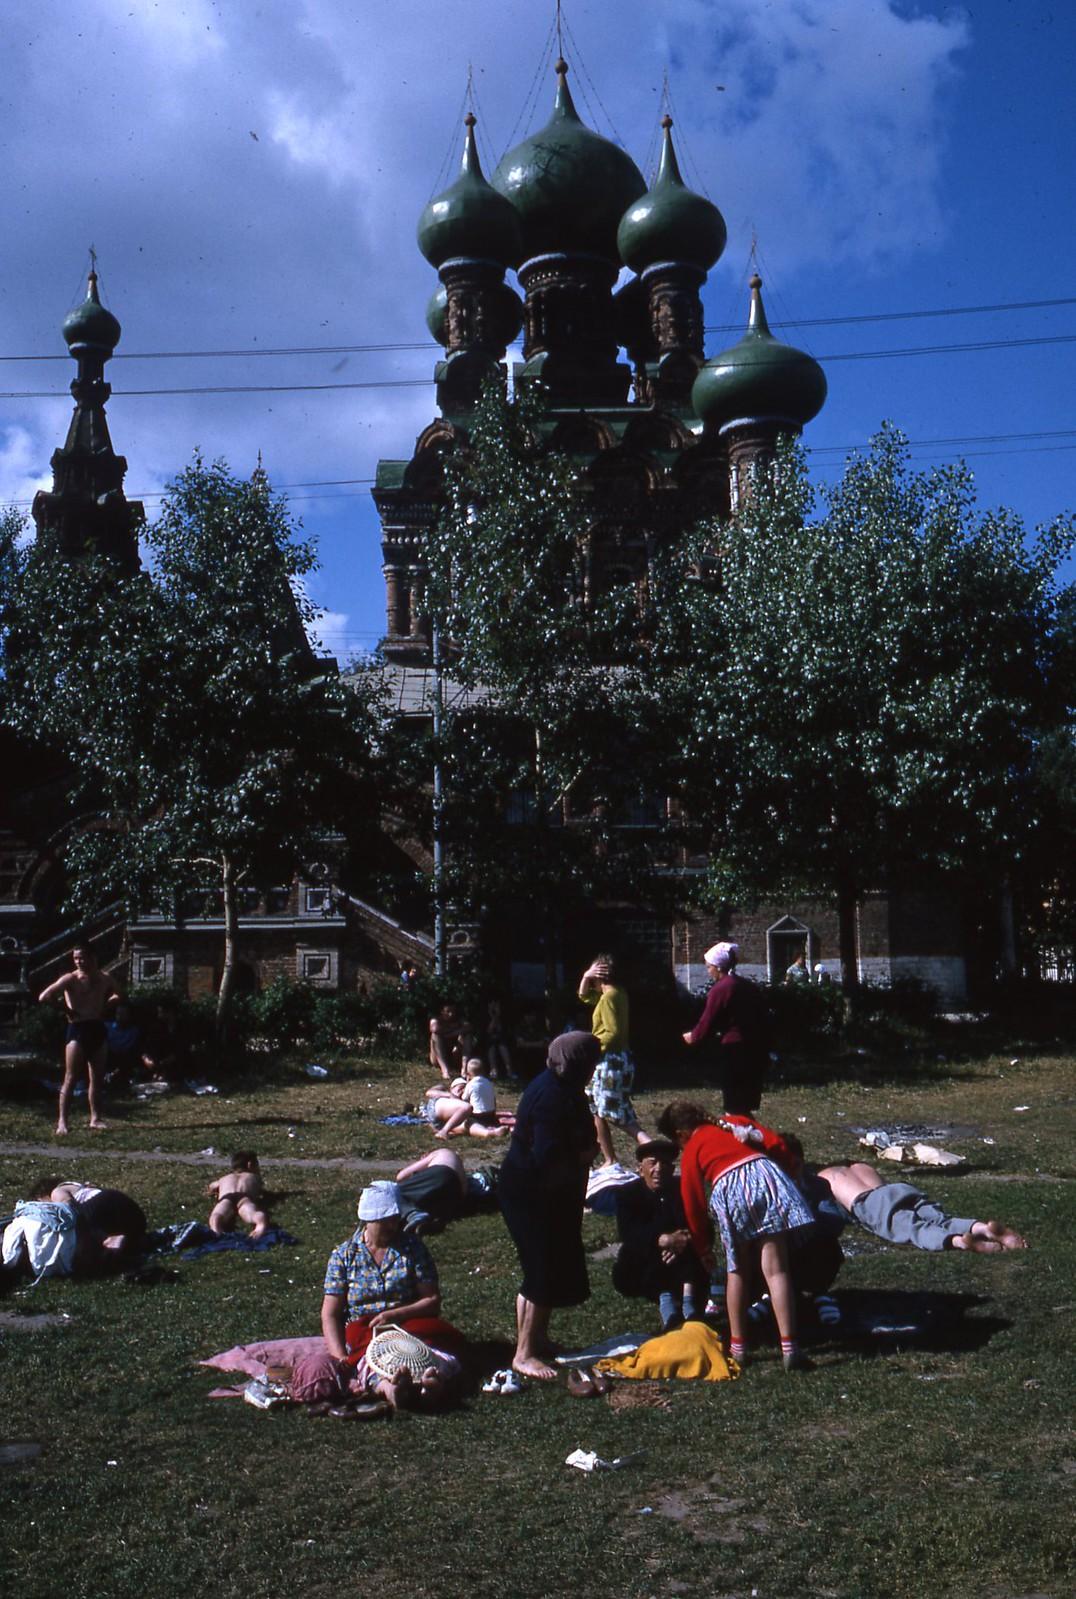 hammond-MA10-Ostankino-people-sunbathing-and-fishing-011